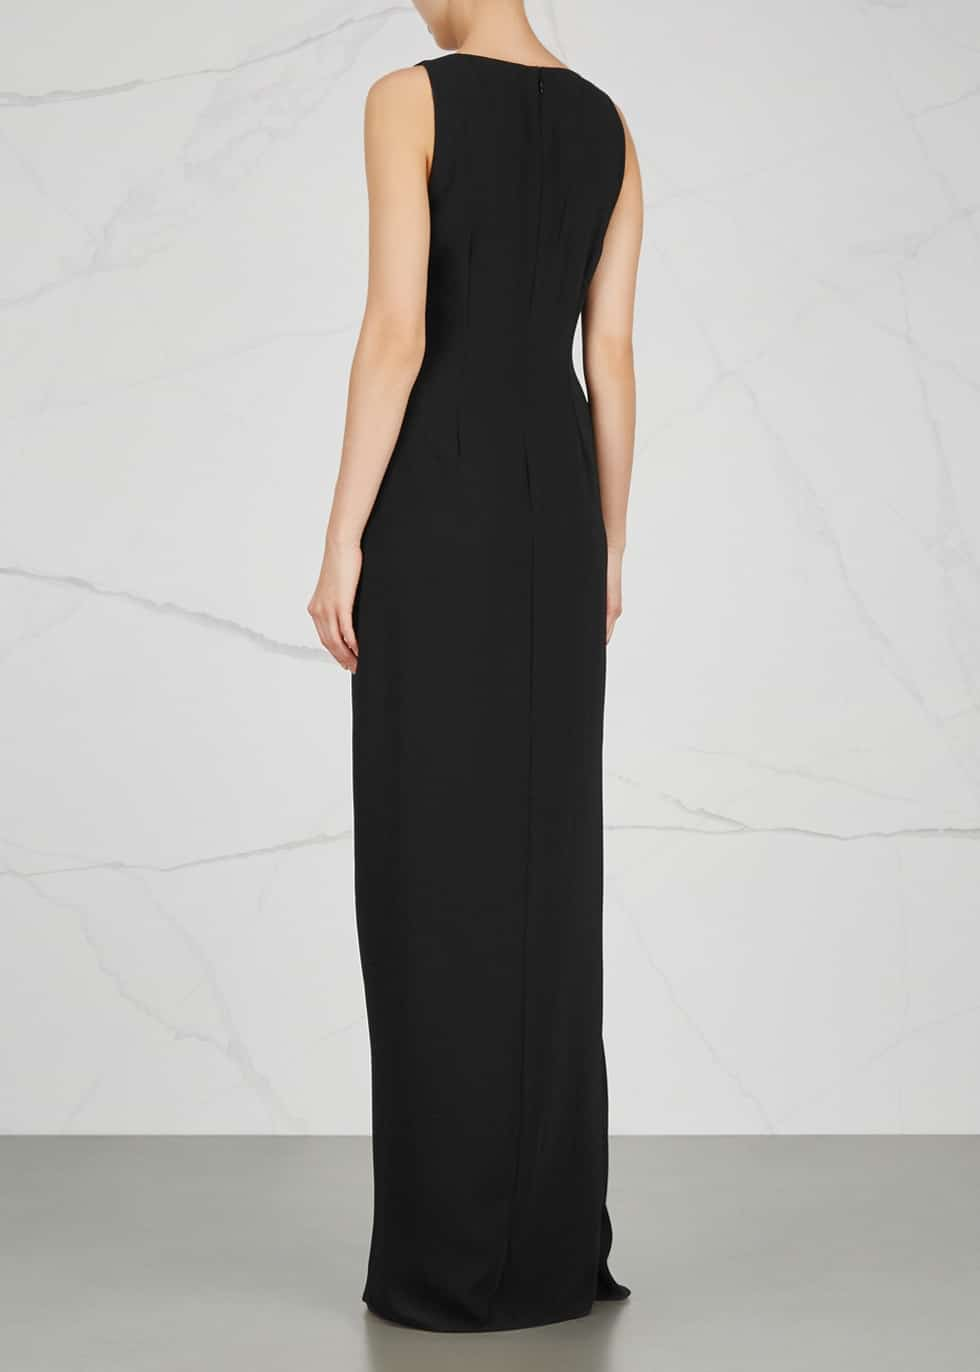 HALSTON HERITAGE Monochrome Ruffled Black Gown